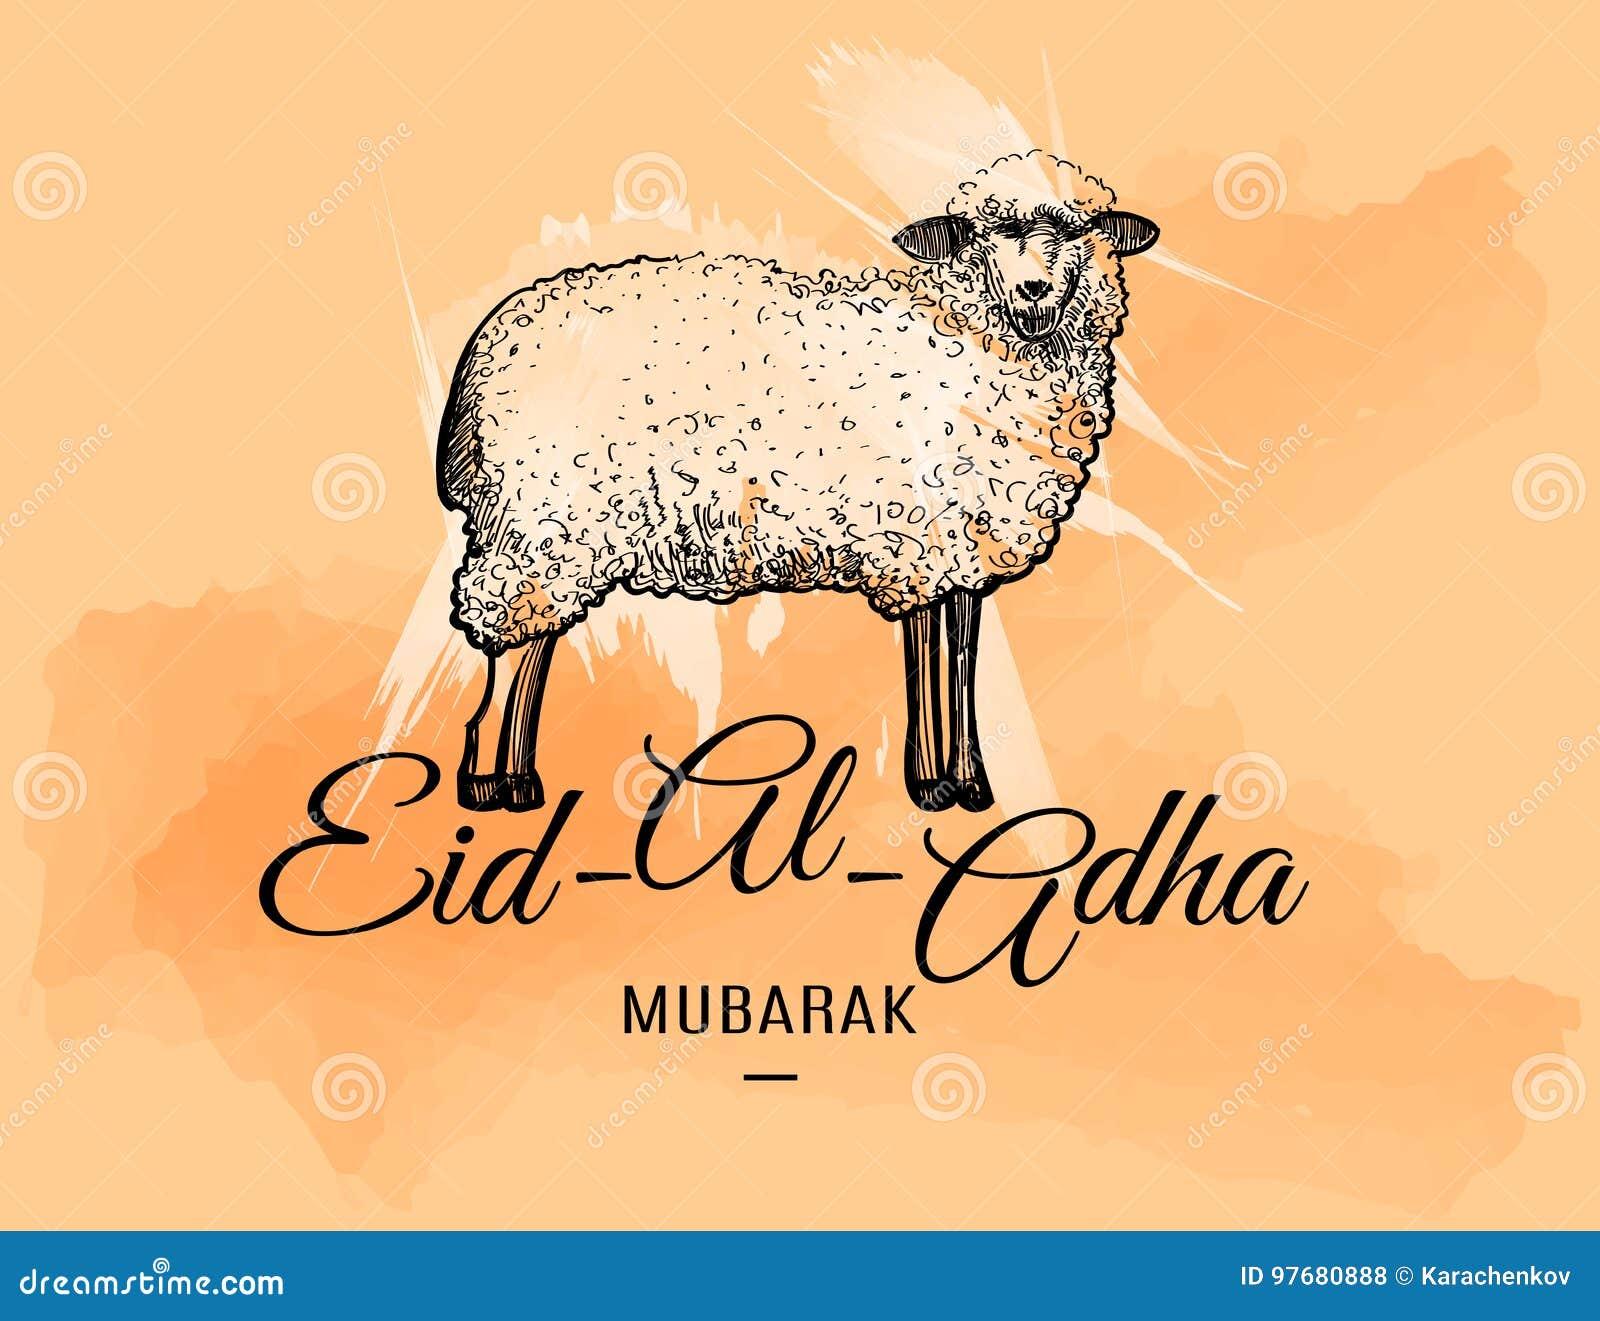 Eid Al Adha Greeting Card With Doodle Sheep Stock Vector